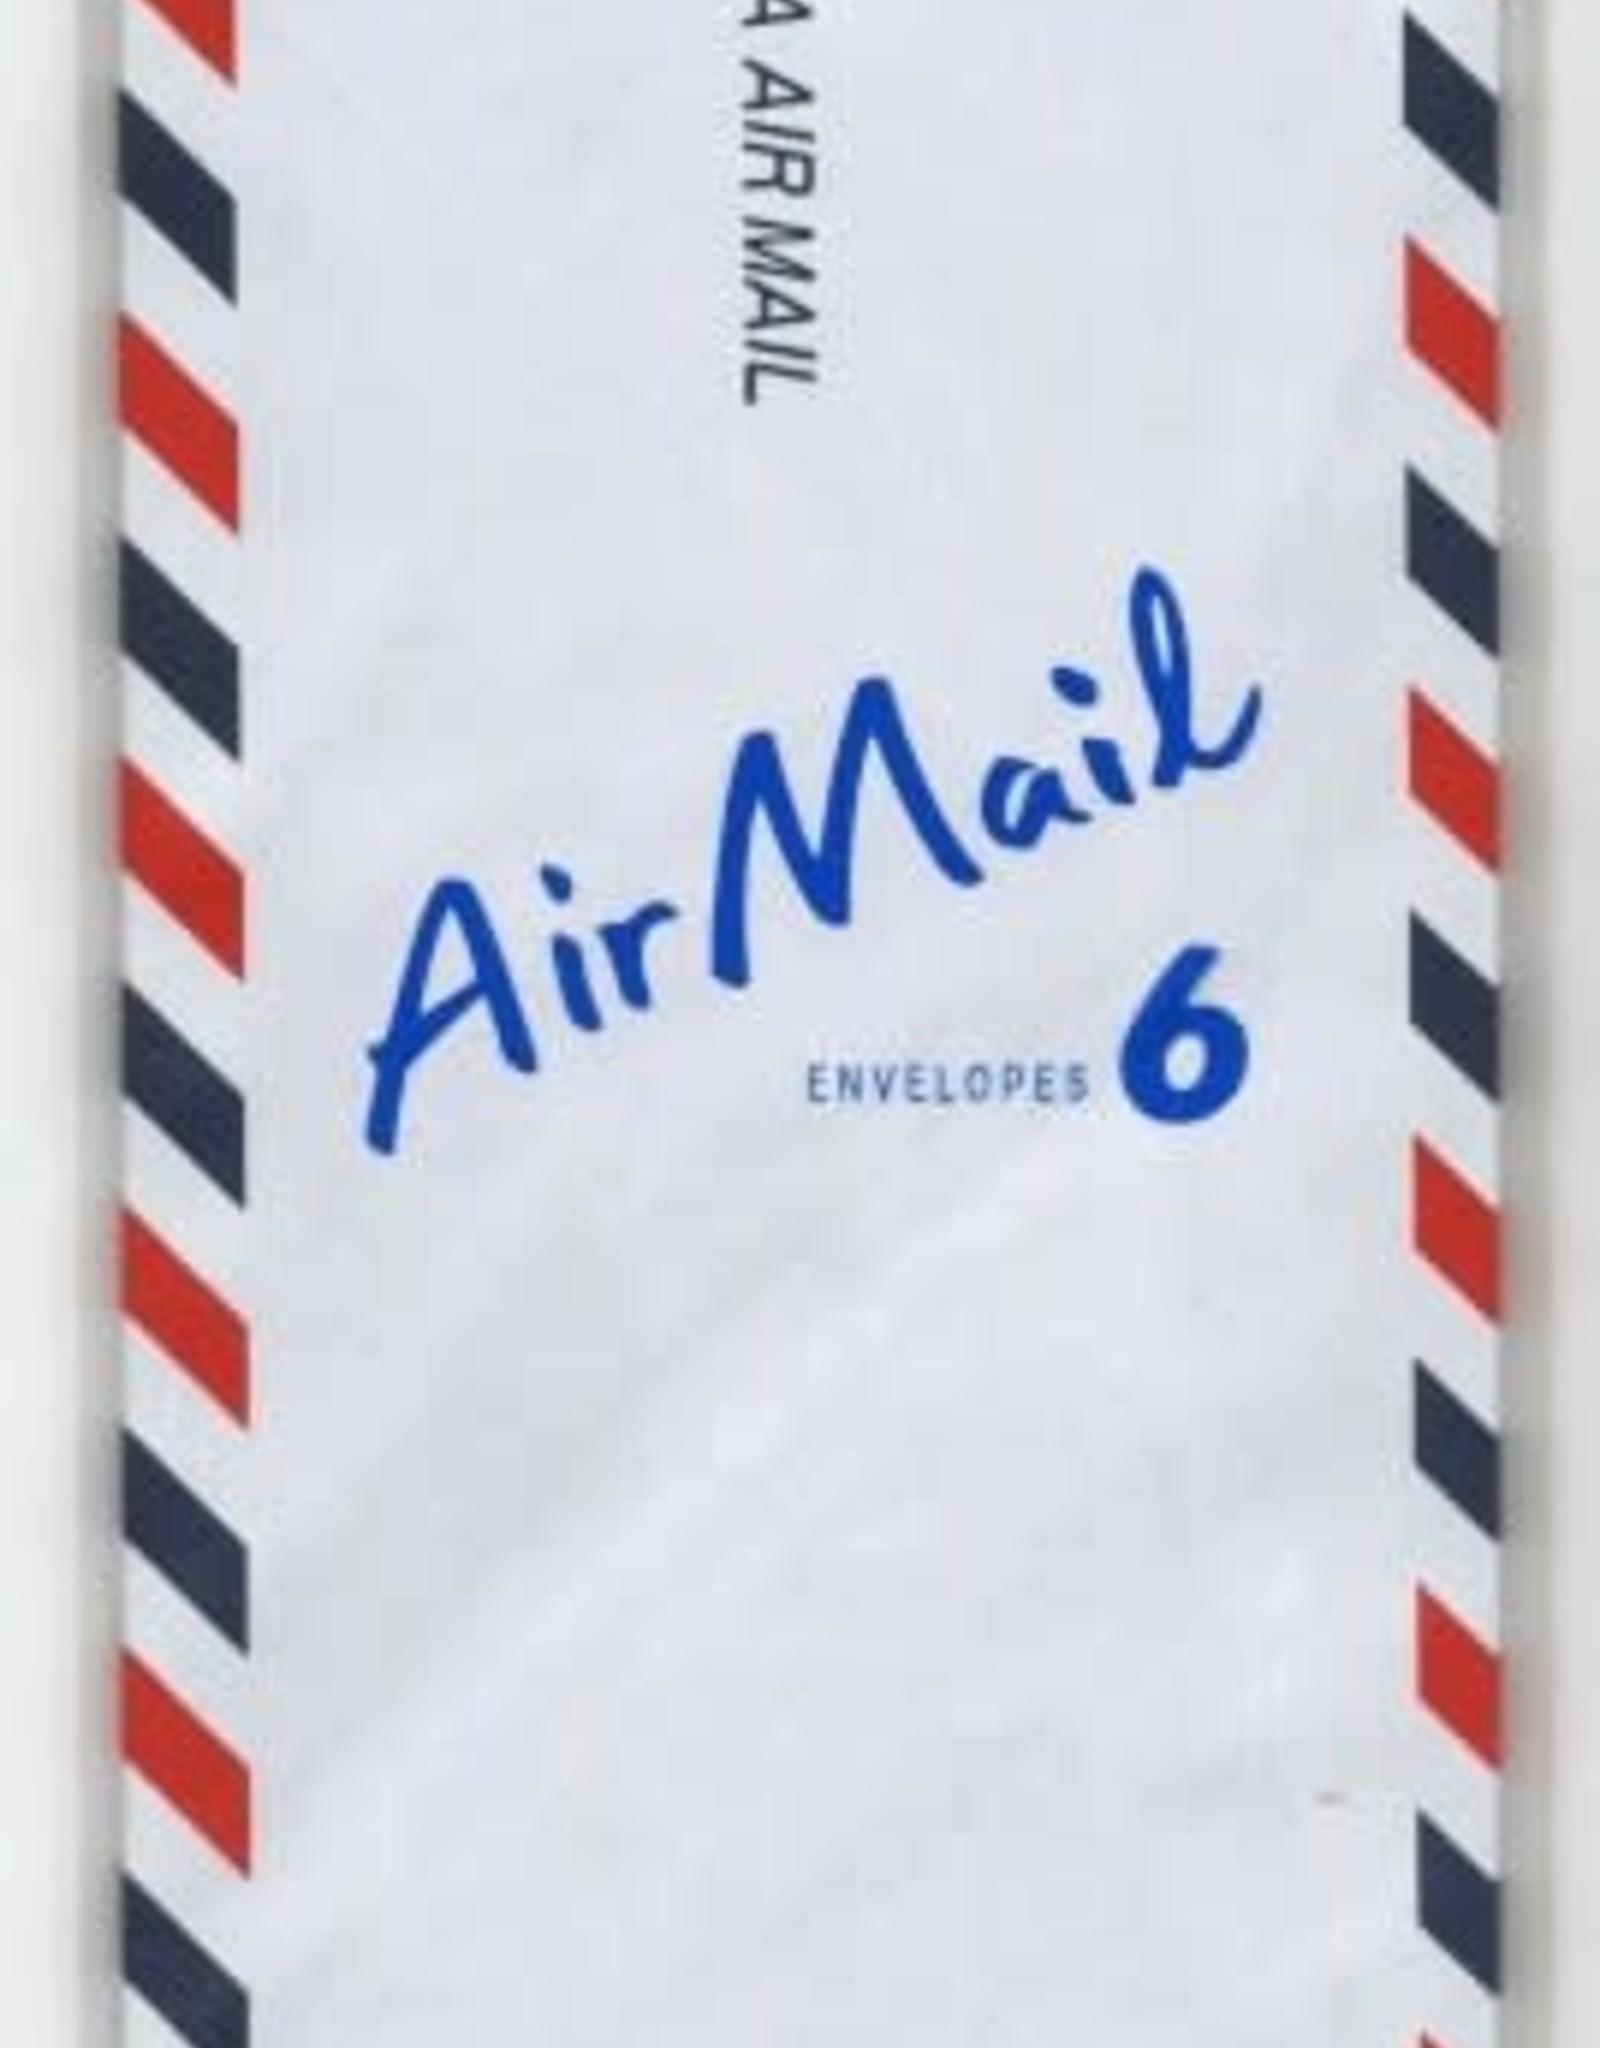 Okina Air Mail Envelopes M